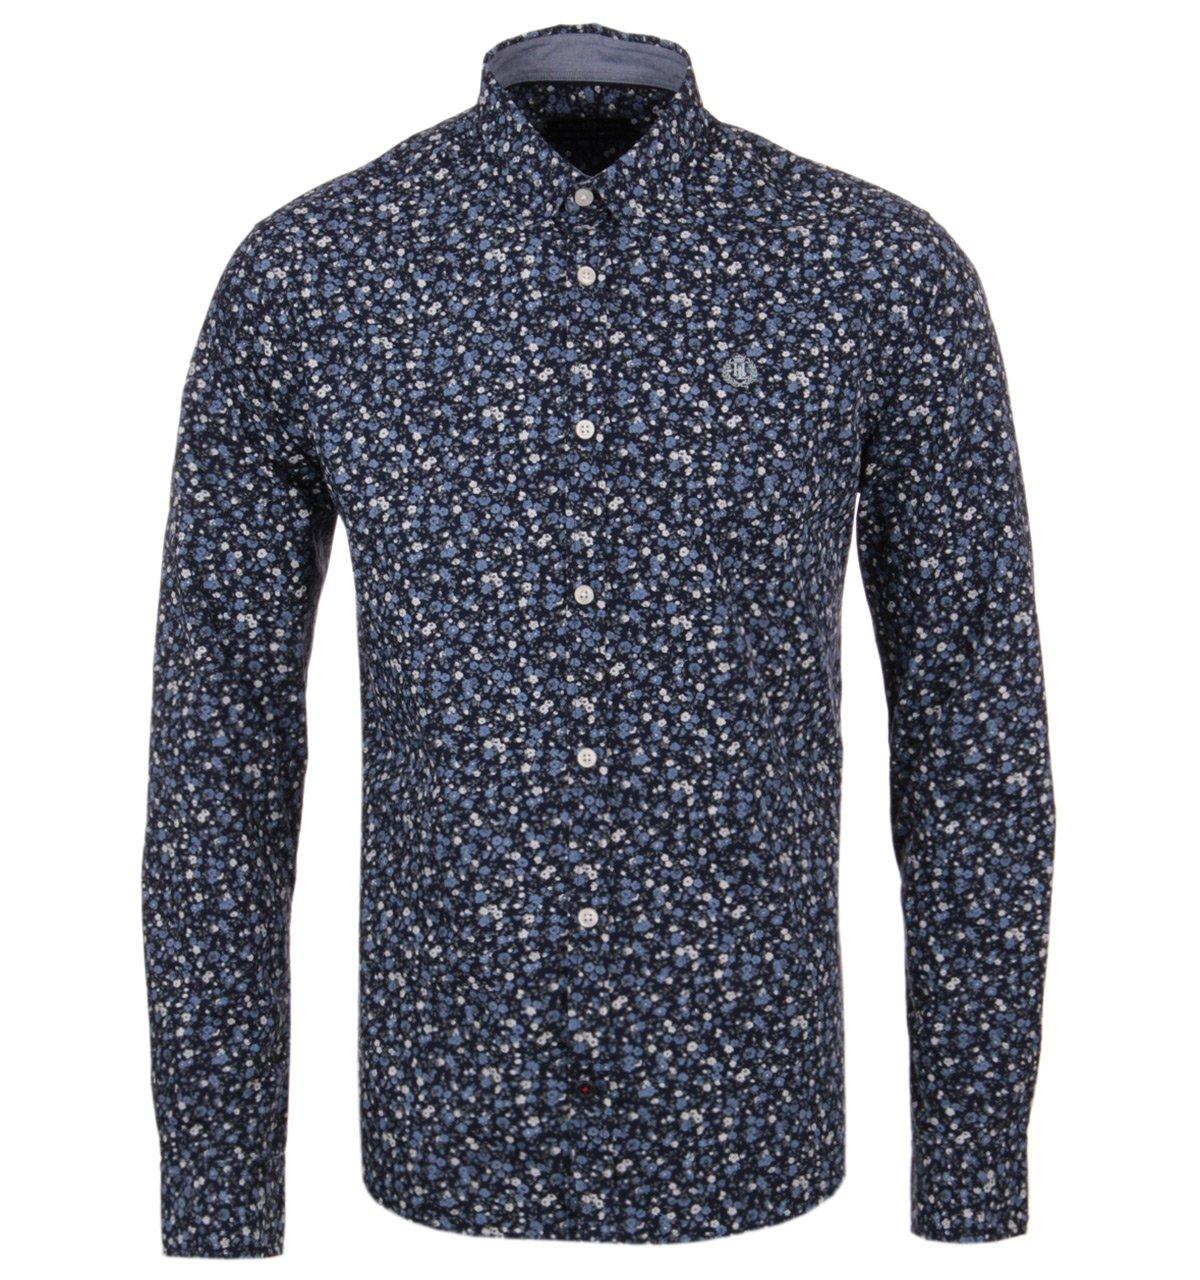 ventas al por mayor XL Henri Lloyd Varfell Navy Navy Navy Floral Long Sleeve Shirt-EXTRA LARGE  lo último